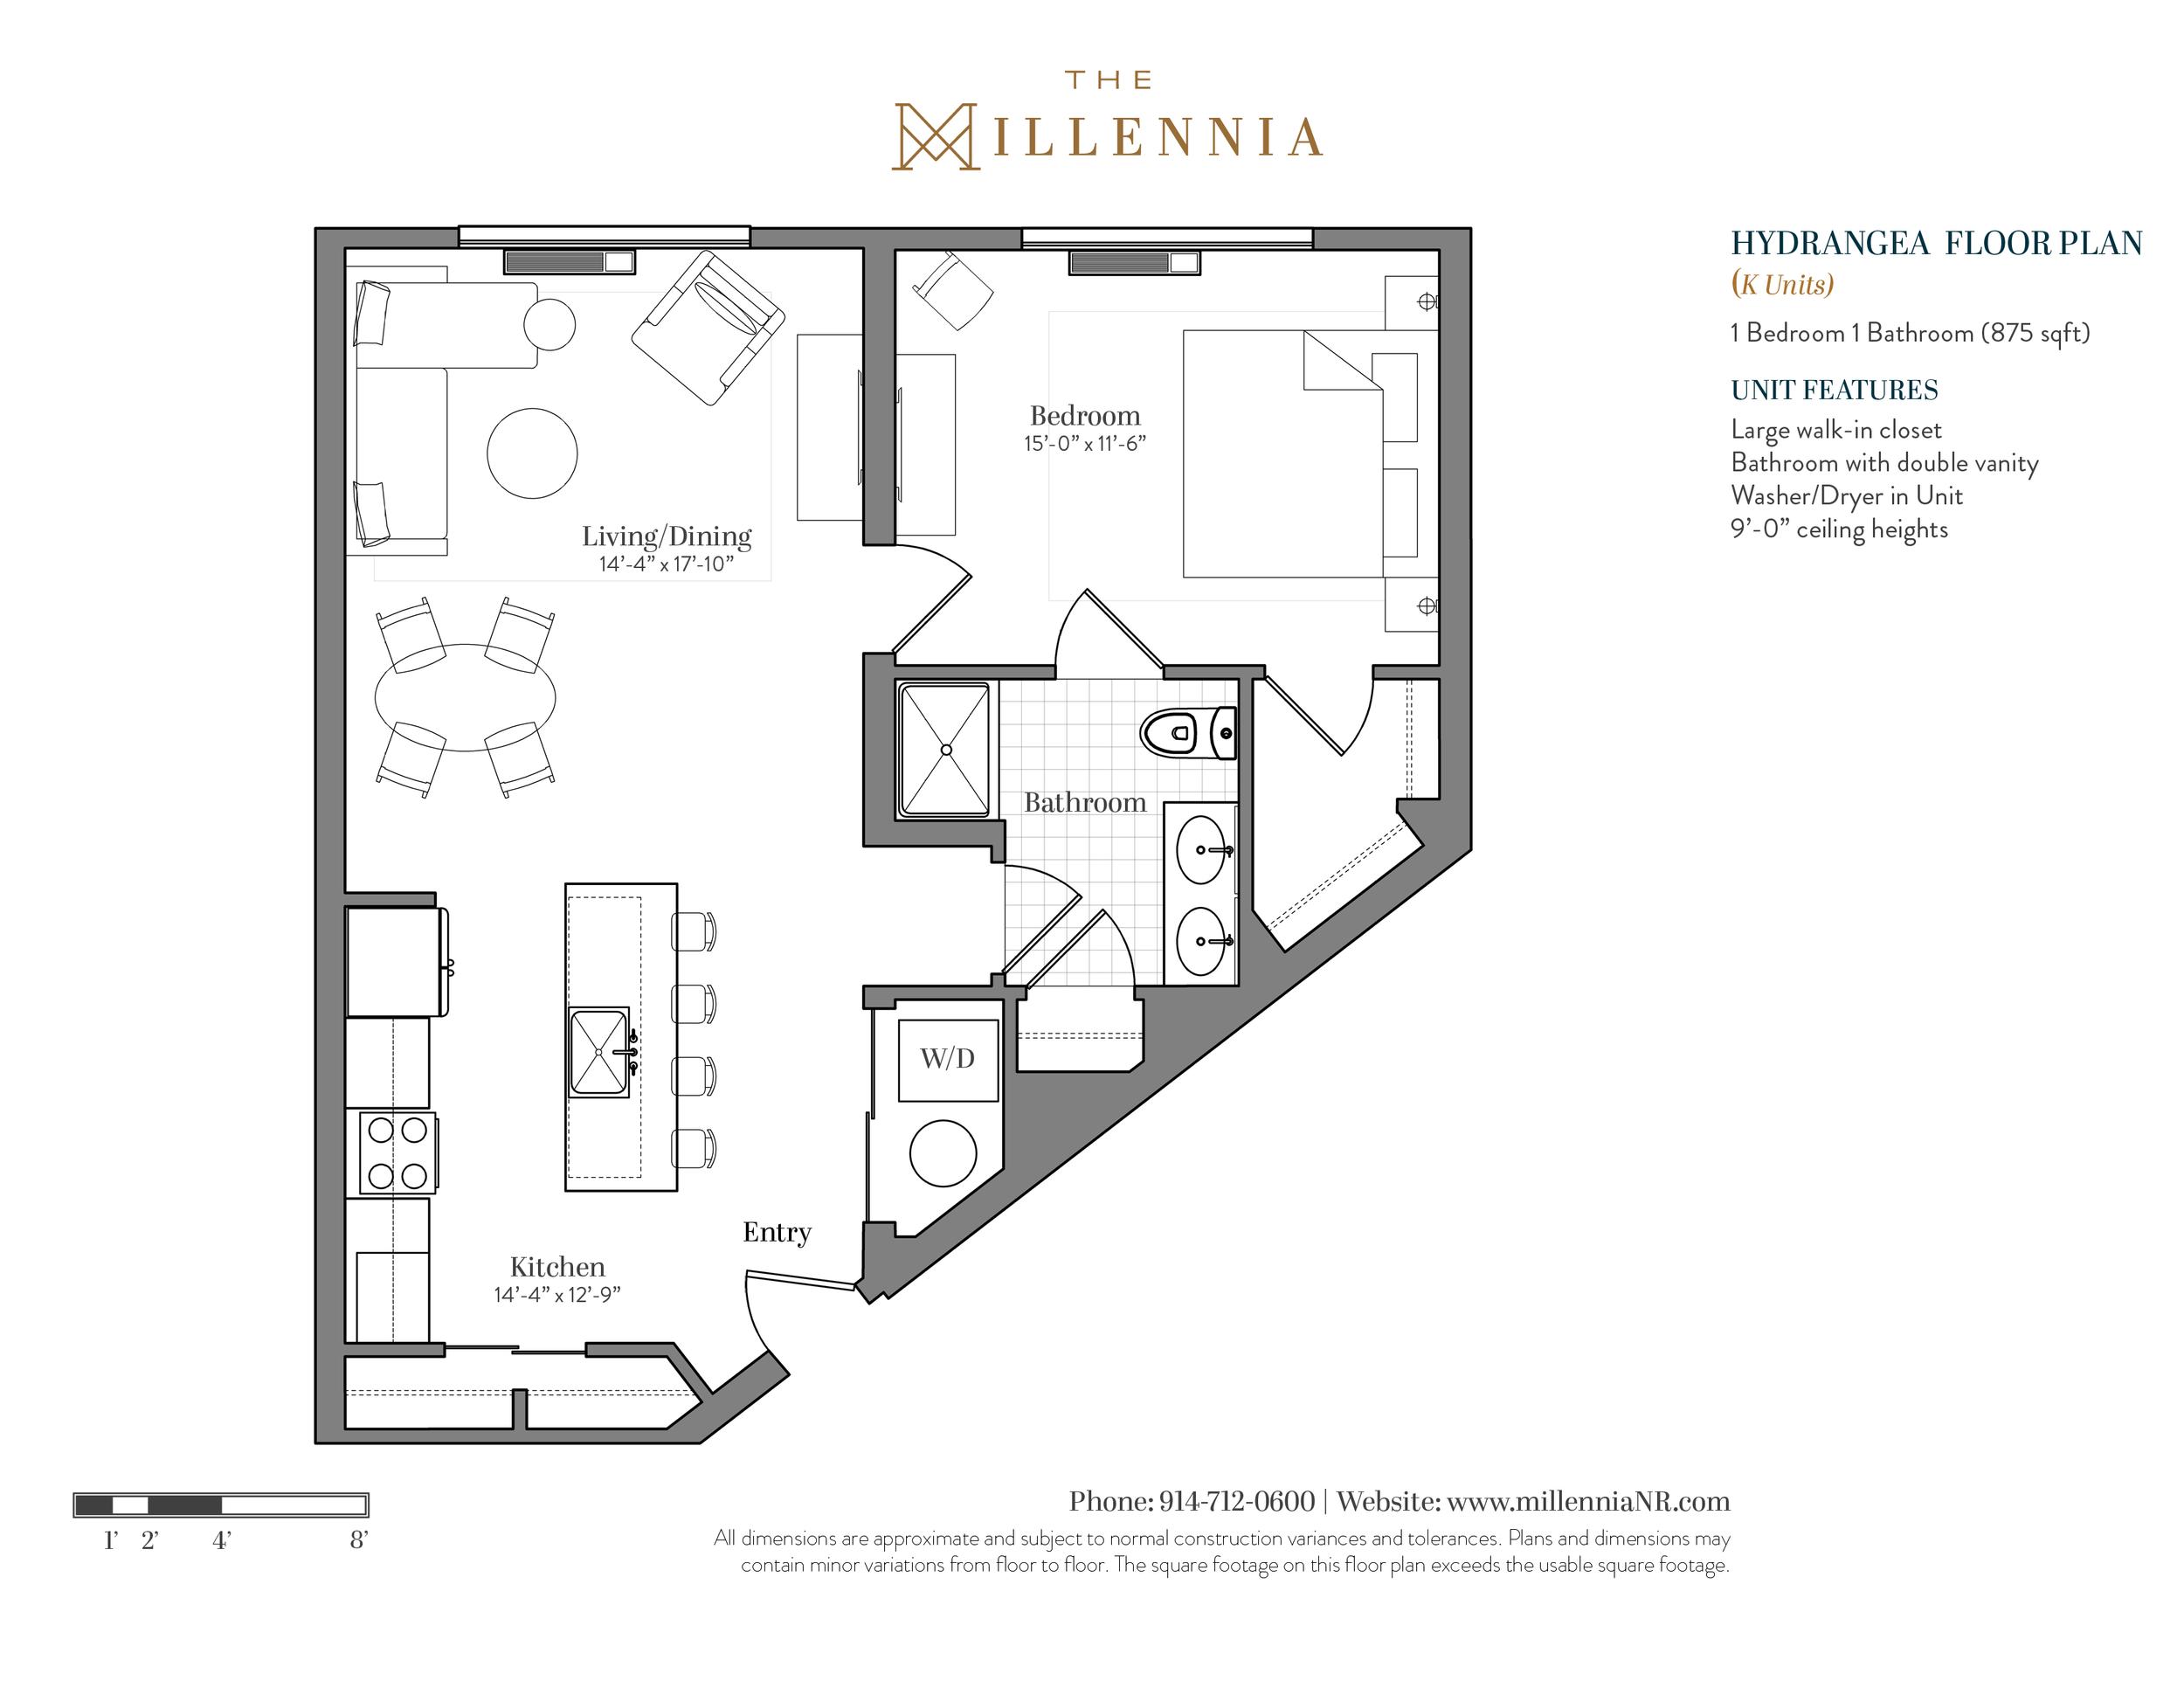 Millennia_Floorplans_Hydrangea.png